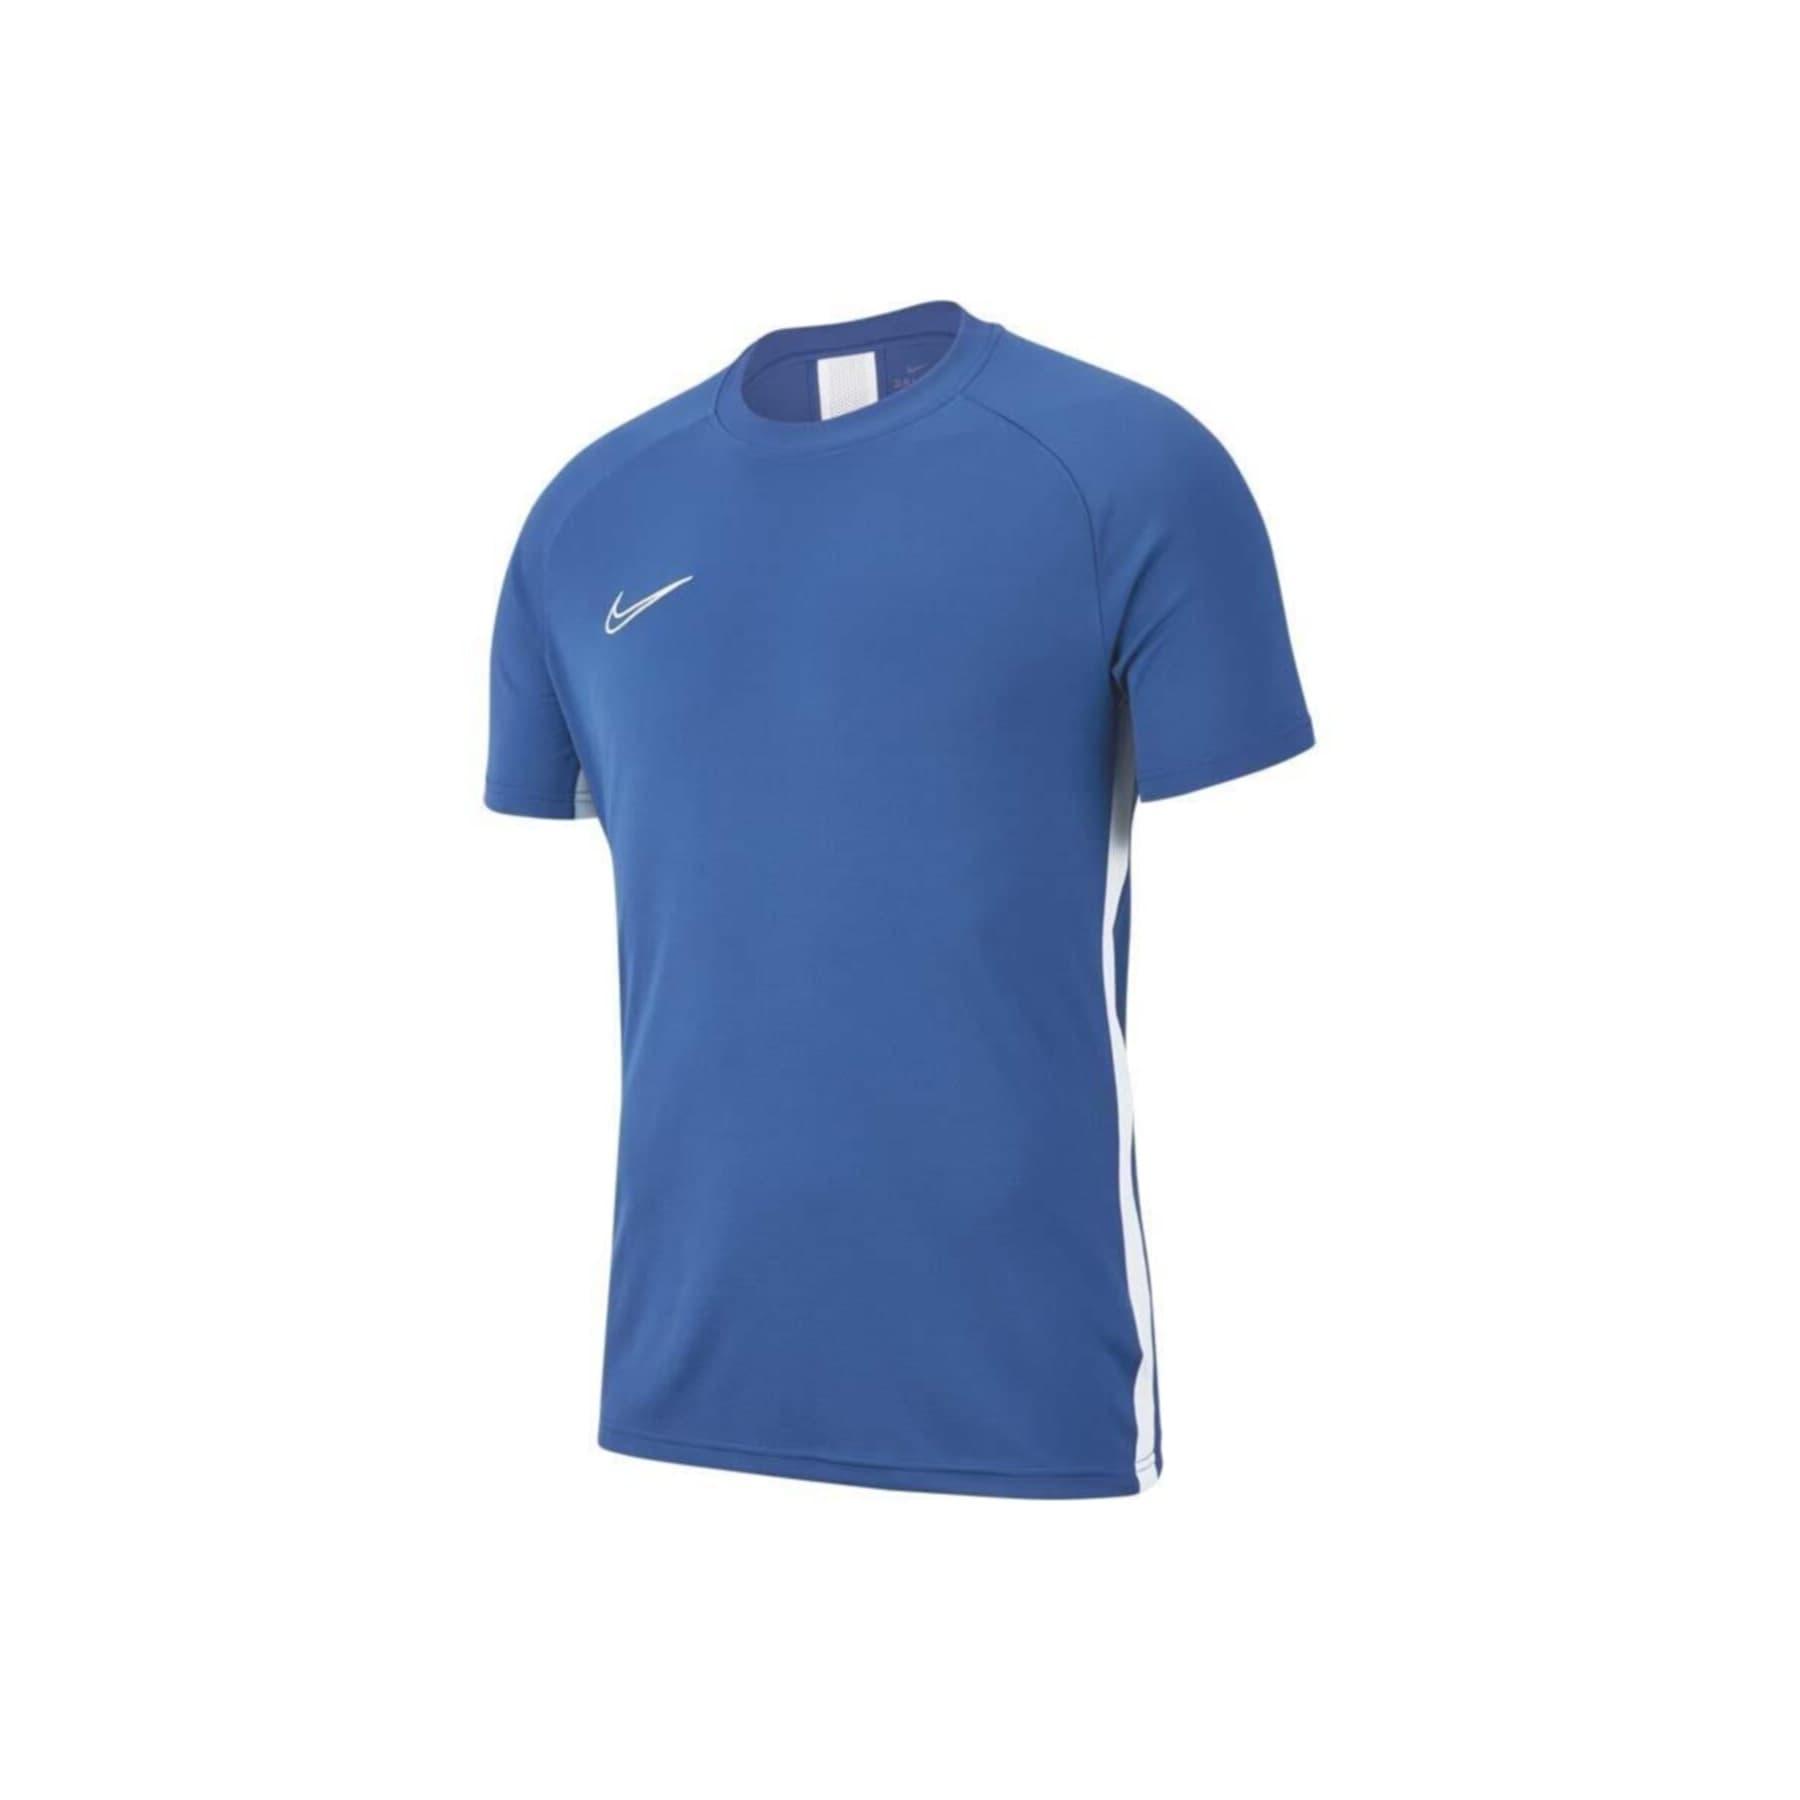 Dry Academy 19 Erkek Mavi Polo Tişört (AJ9088-404)